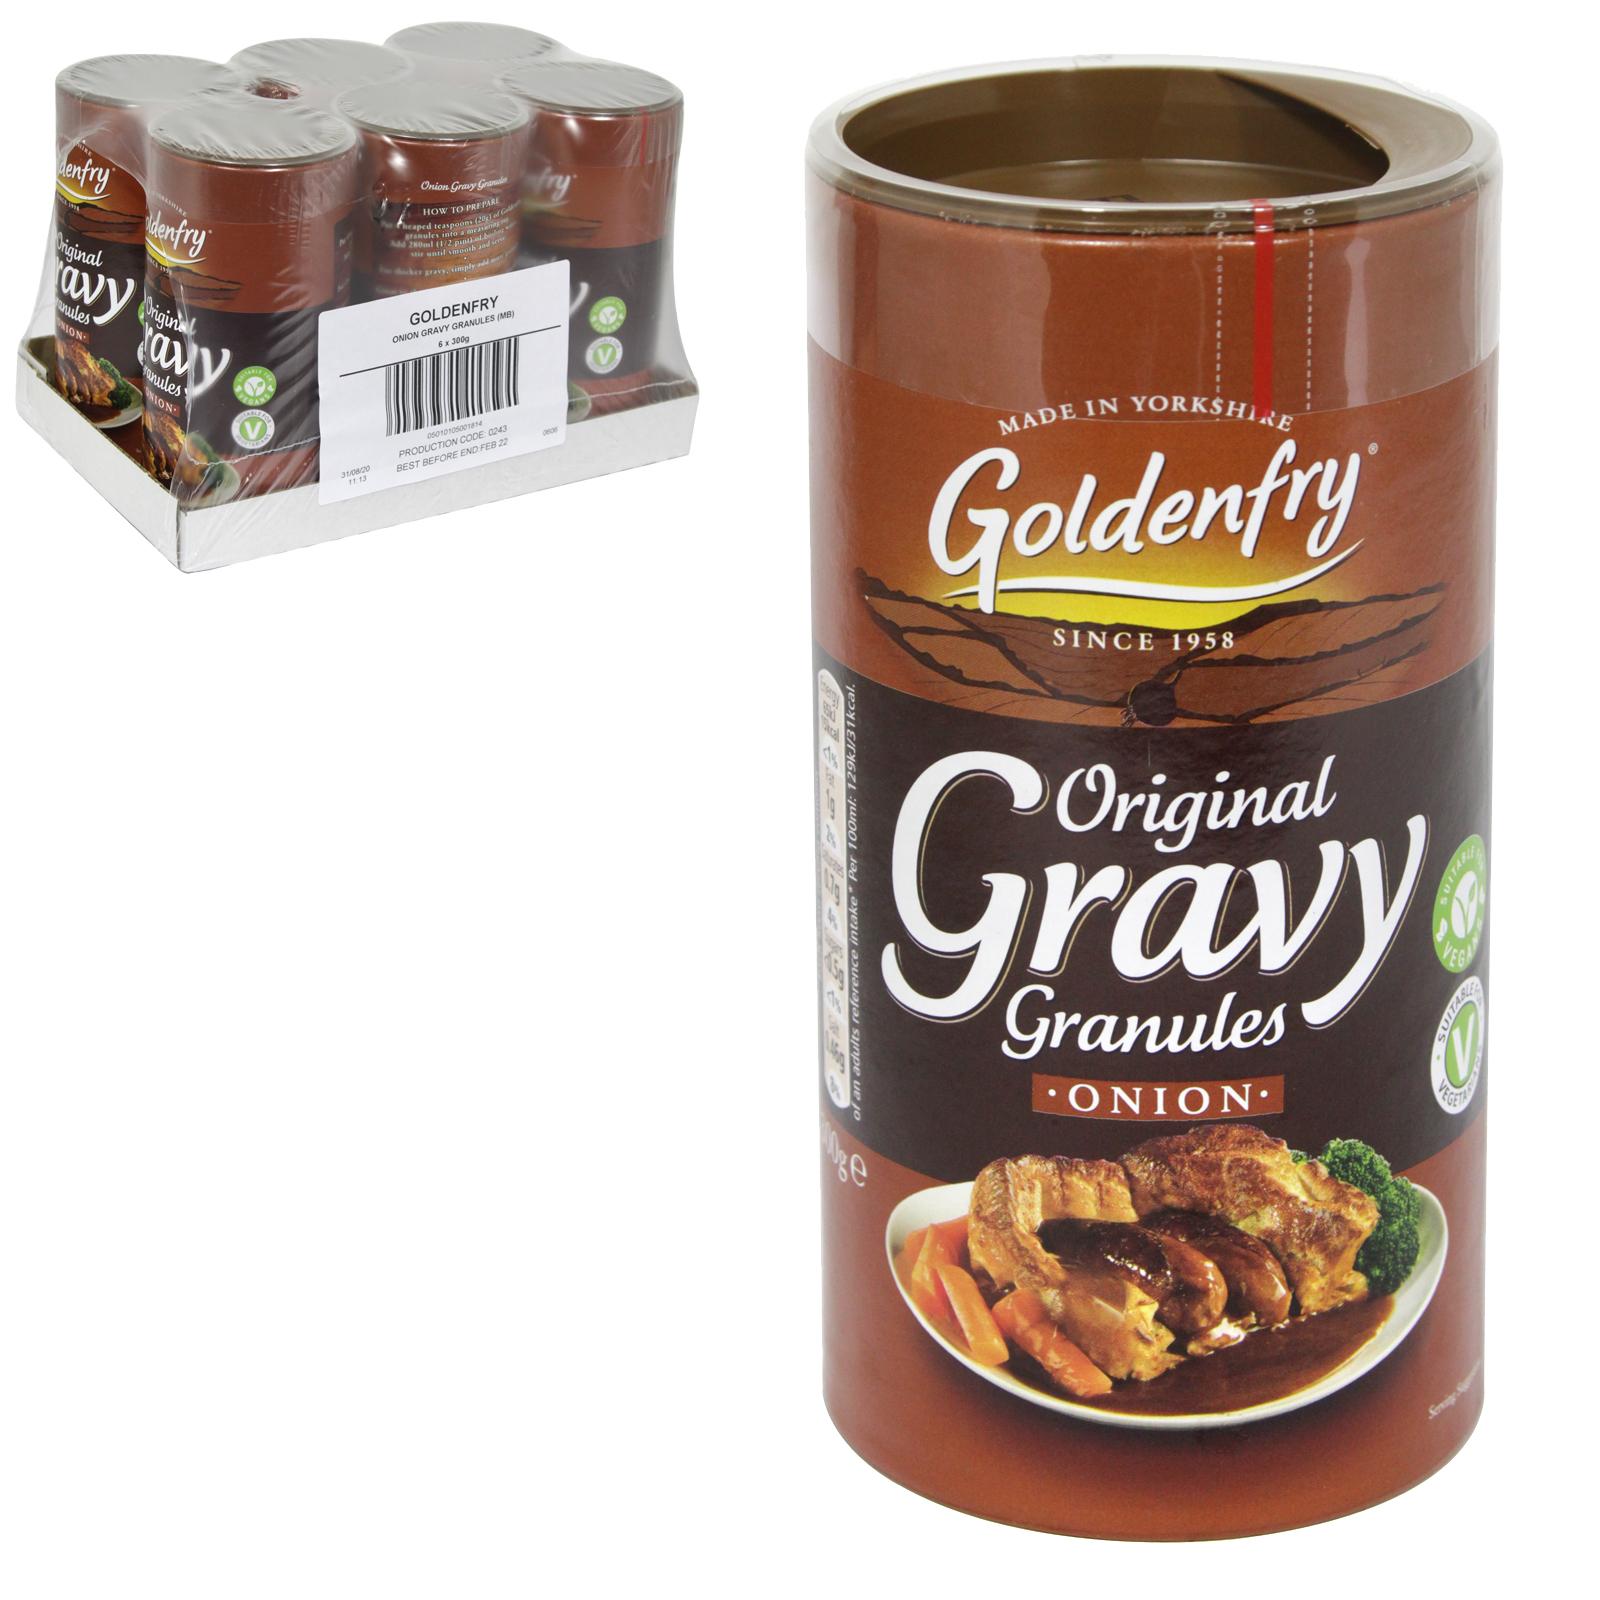 GOLDEN FRY ONION GRAVY GRANULES 400G PM ?1.49 X6